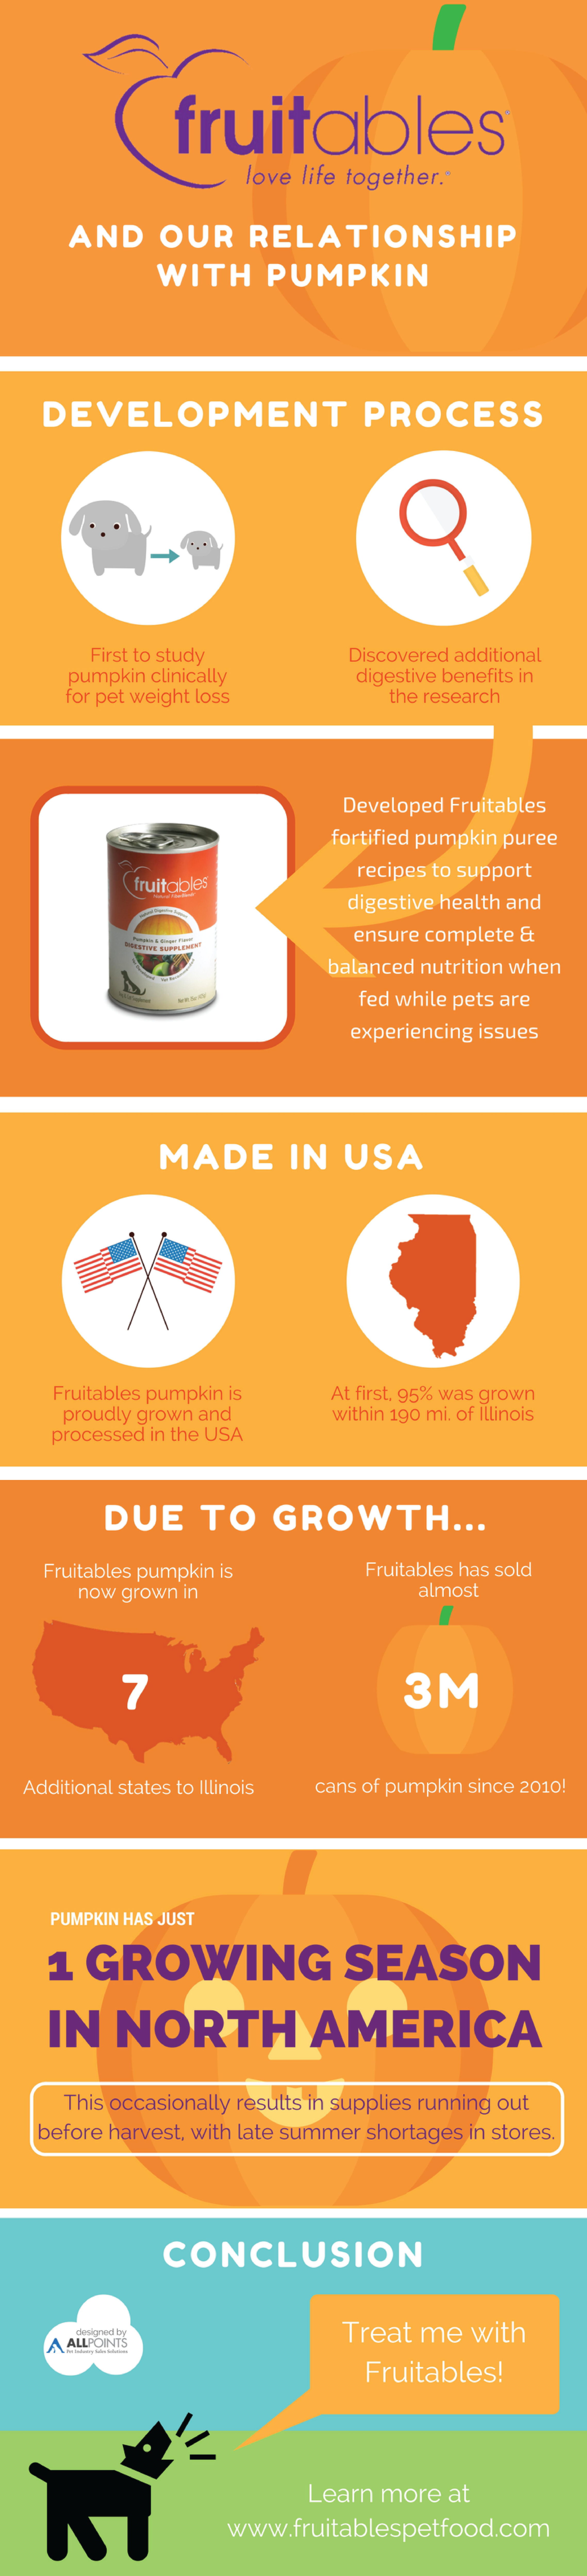 Fruitables-Fun-Facts-Pumpkin.png